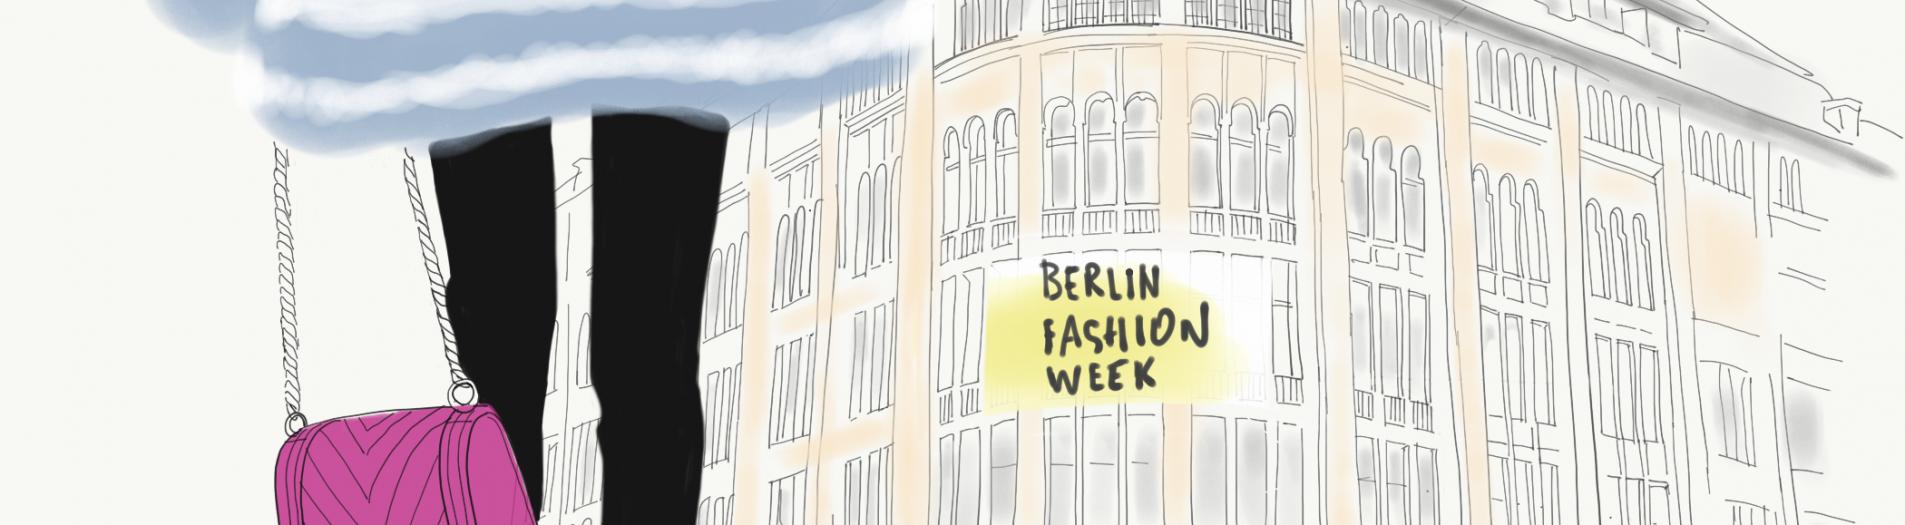 Berlin Fashion Week W2017